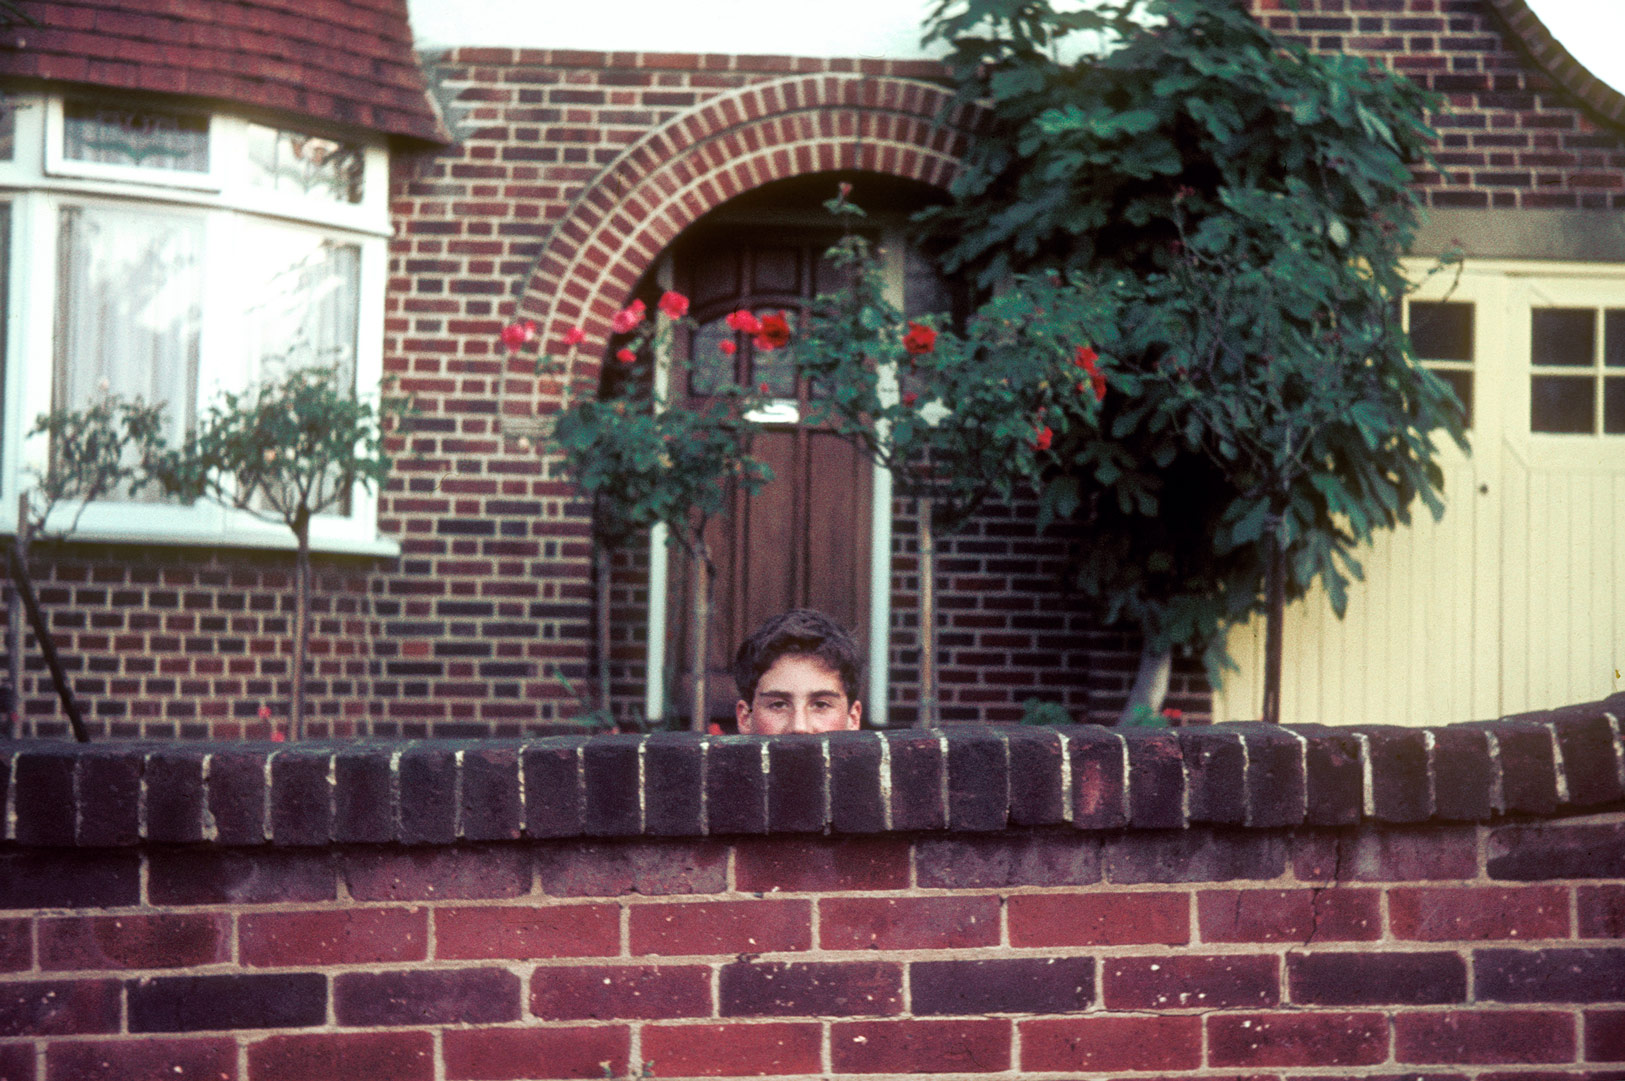 Dad Peeping, Unknown, 2013 © Dana Stirling